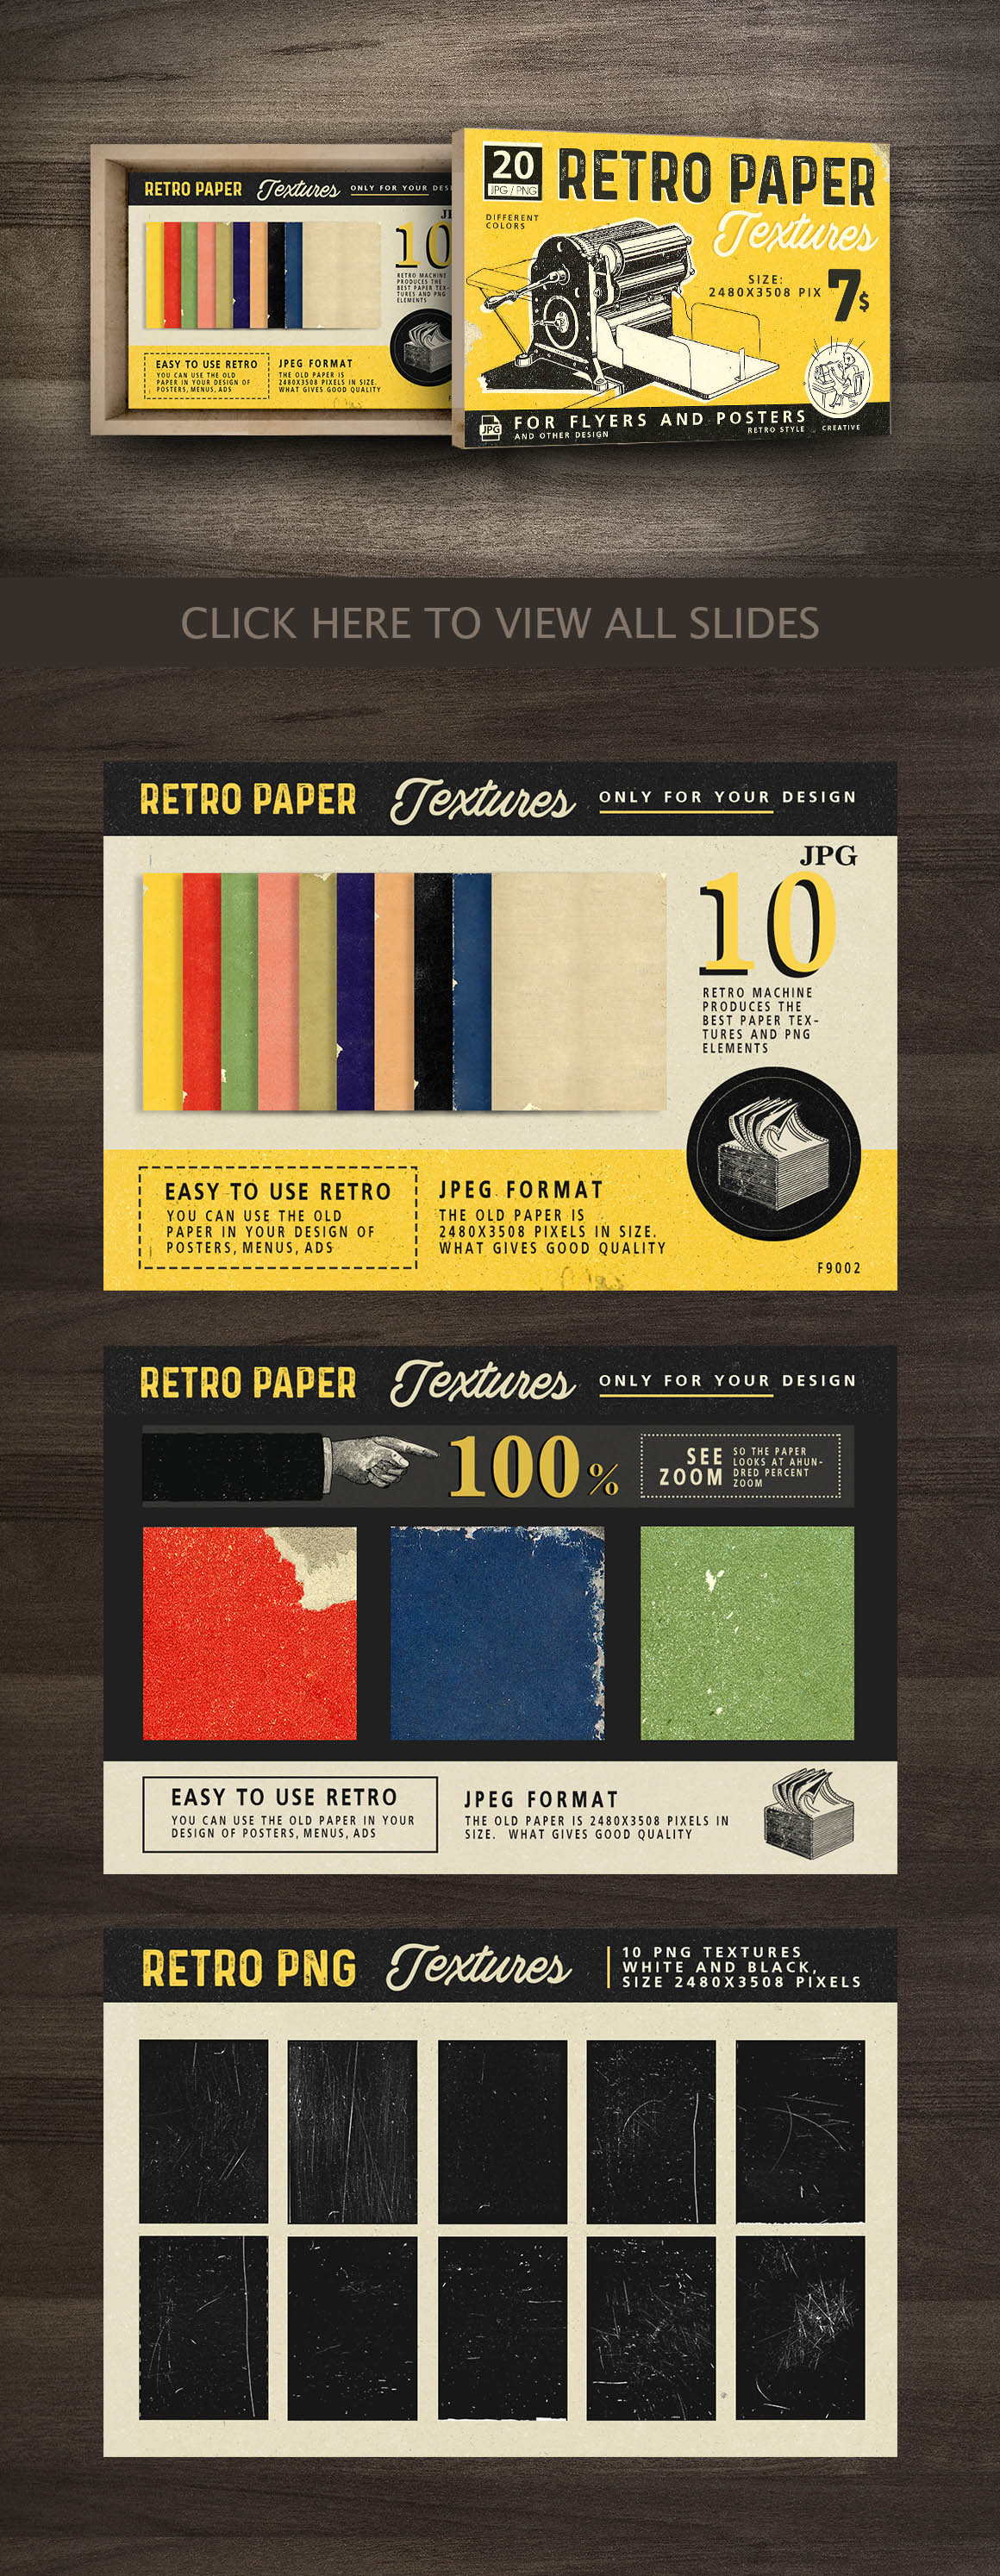 Retro-Graphics-Bundle-dealjumbo-13